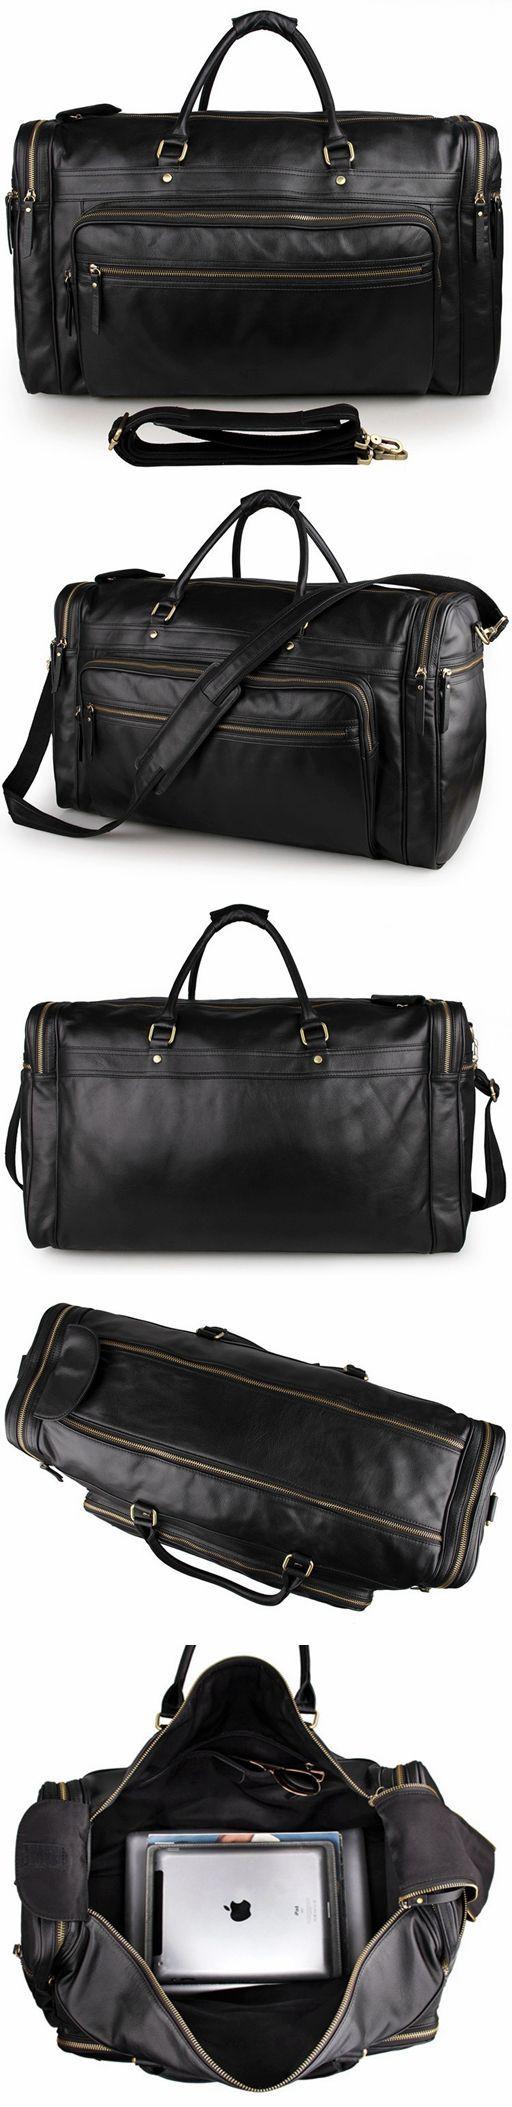 Handmade Full Grain Leather Mens Duffle Bag Chloe Handbags Handbag Brands  7317 cd2cac067e53f